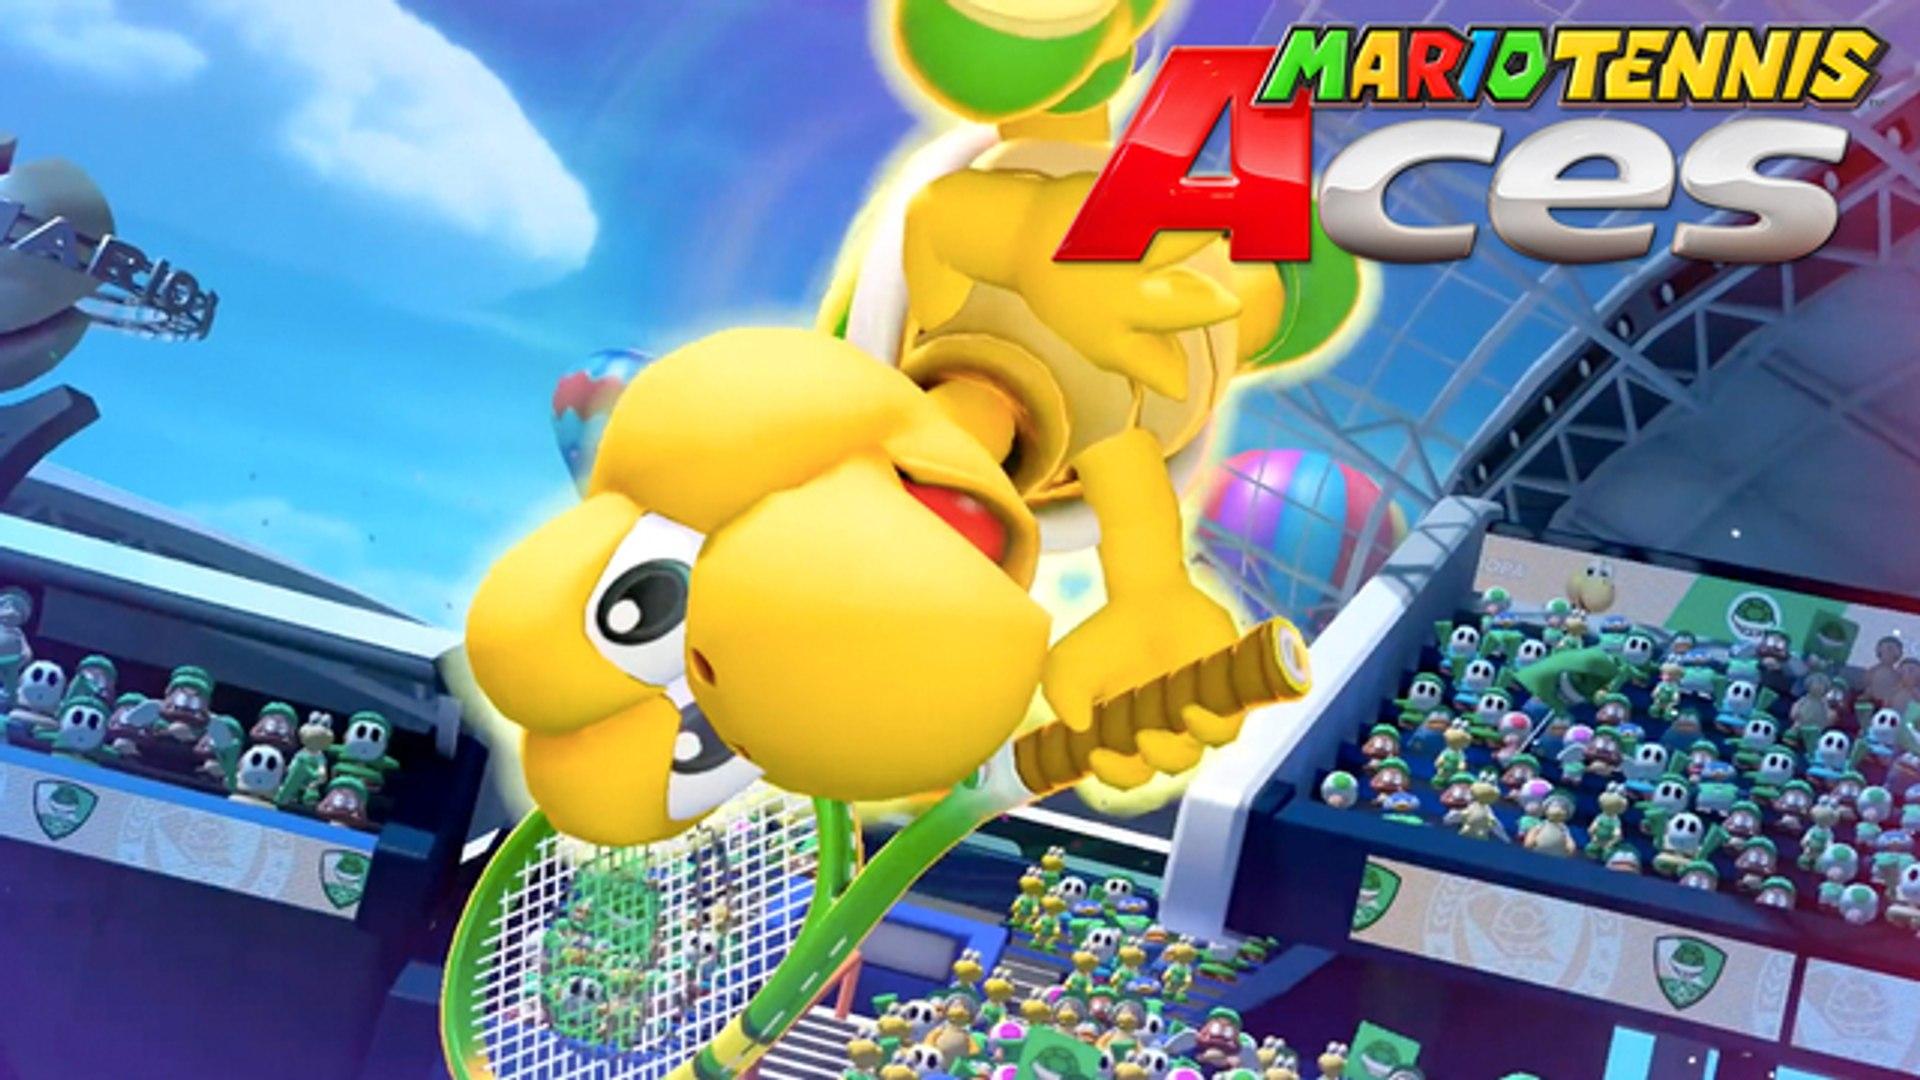 Mario Tennis Aces Official Nintendo Switch Trailer